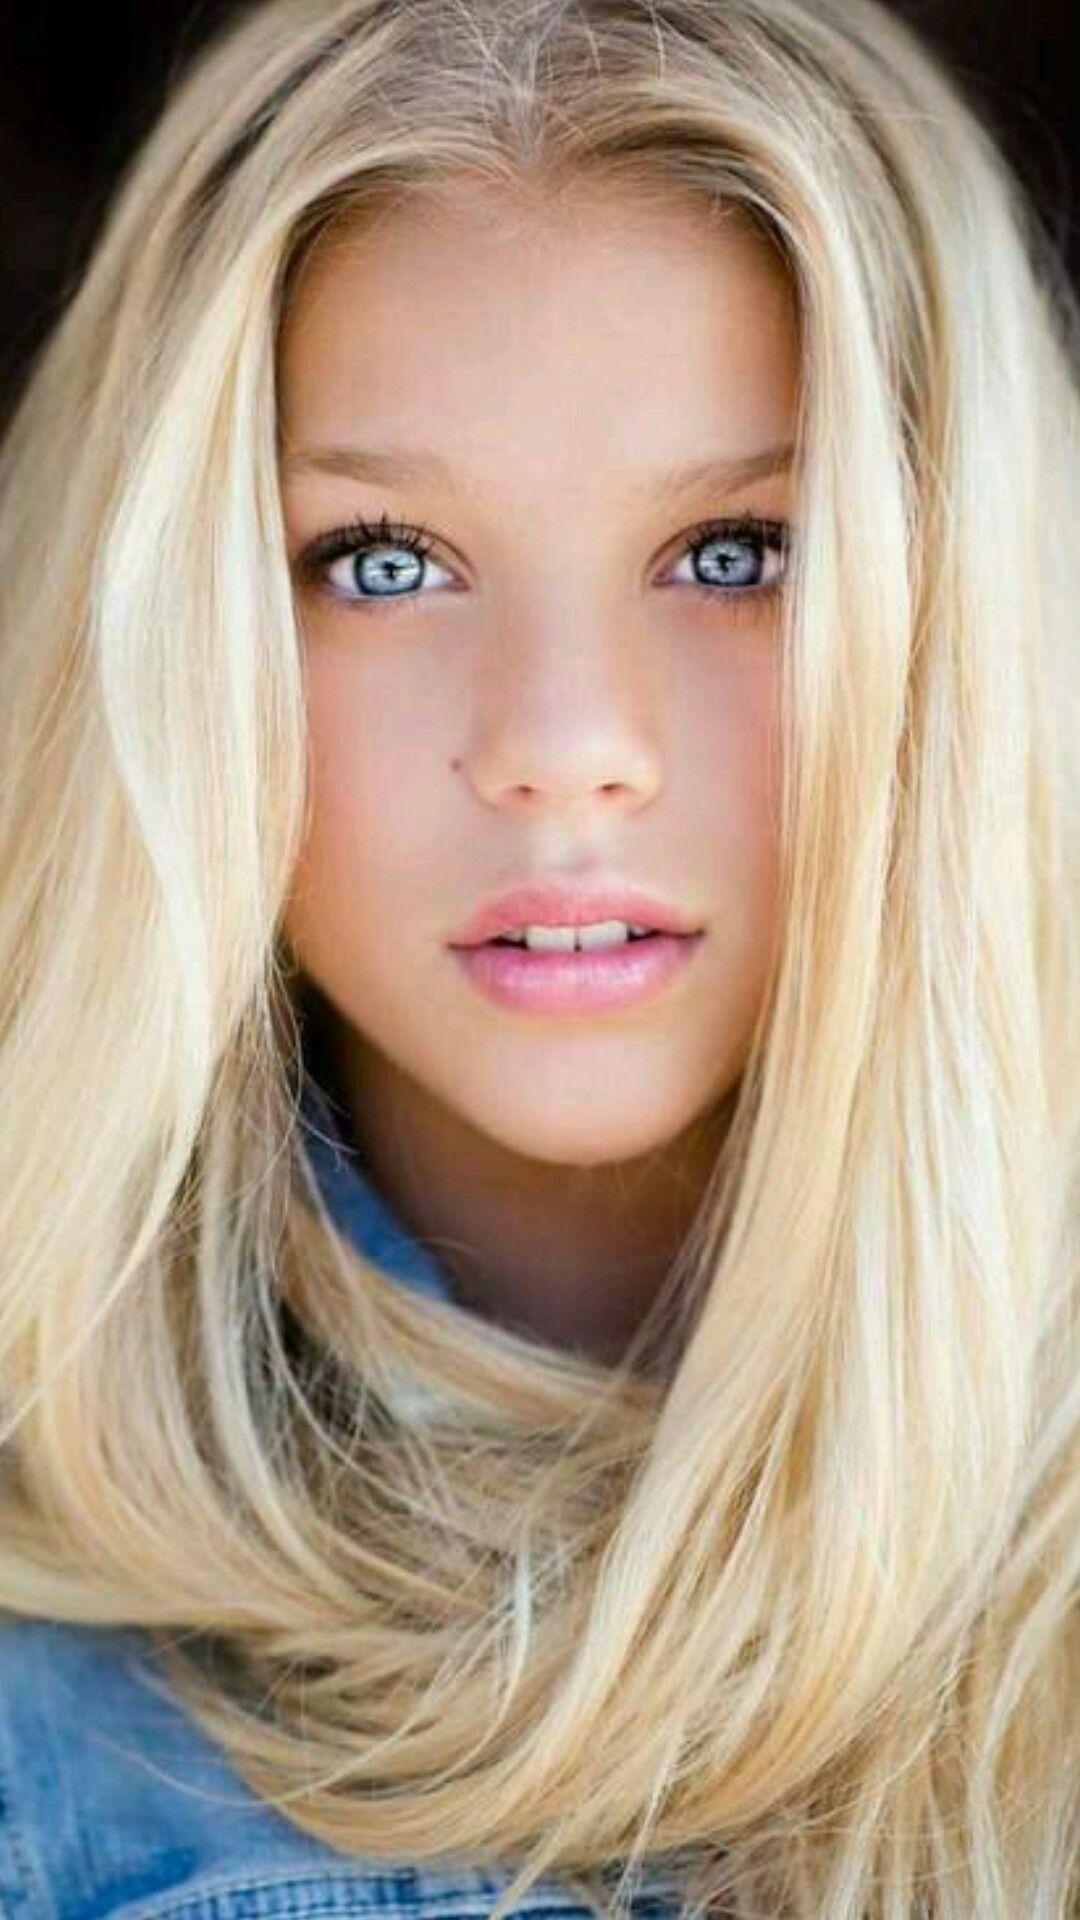 b67c1e49f1 Gente Bonita, Cara Bonita, Mujer Bonita, Ojos Lindos, Rostro Hermosos,  Rostro